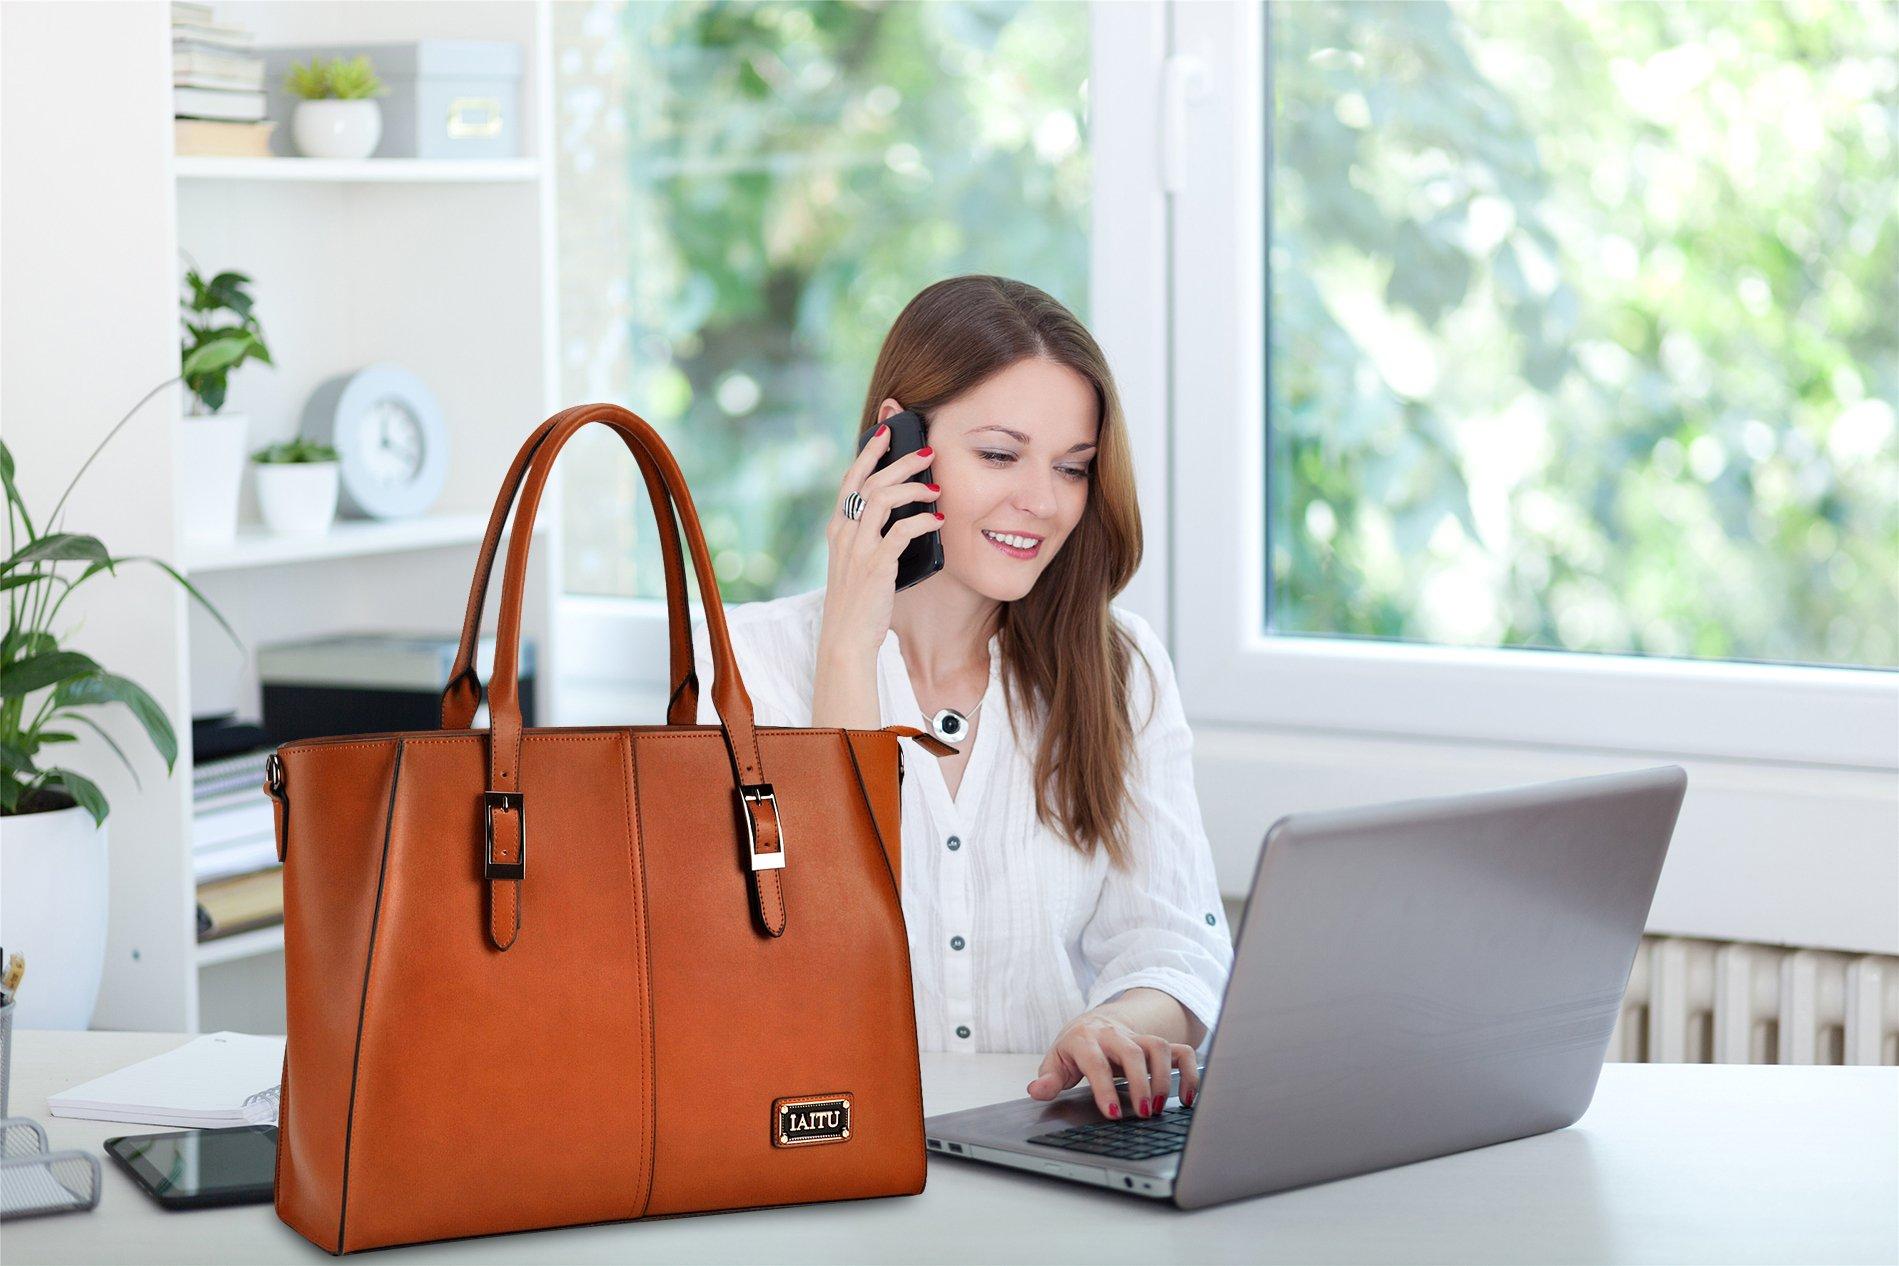 IAITU Laptop Tote Bag,15.6 Inch Crossbody Laptop Bag Casual Work Business Handbag with Smooth Zipper for Women(Brown) by IAITU (Image #6)